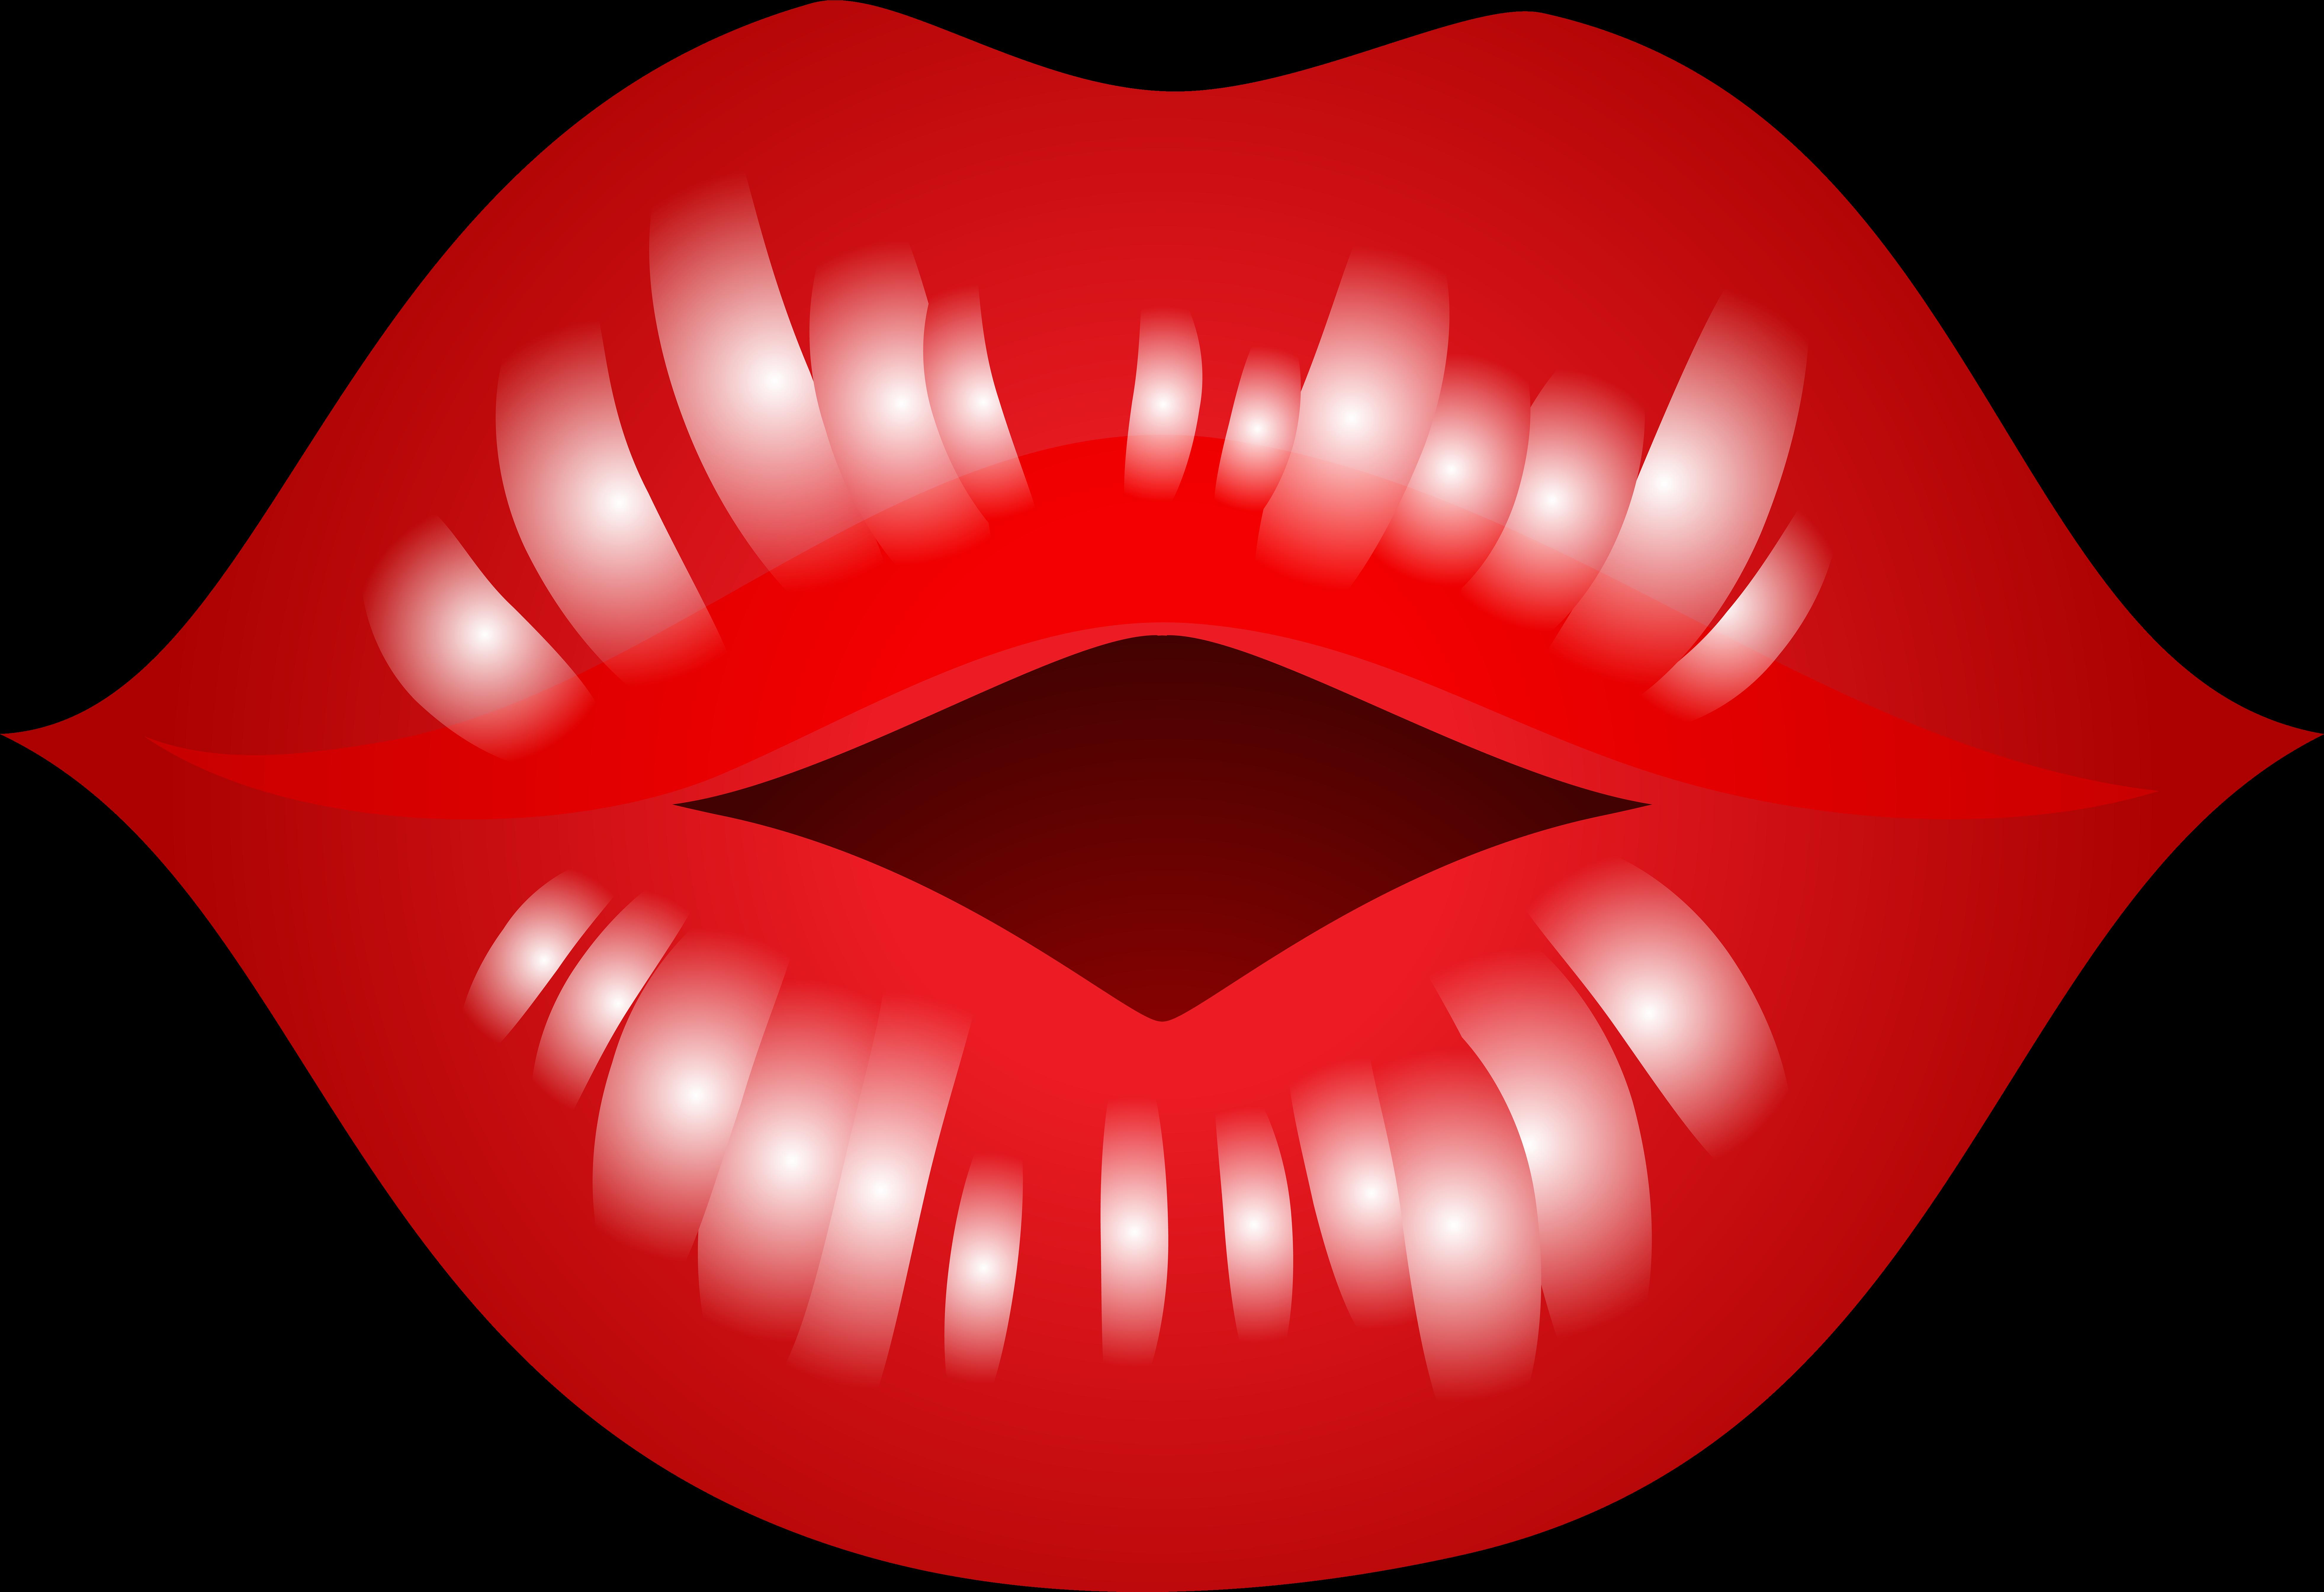 Kiss clipart full lip. Kissing lips size pinclipart